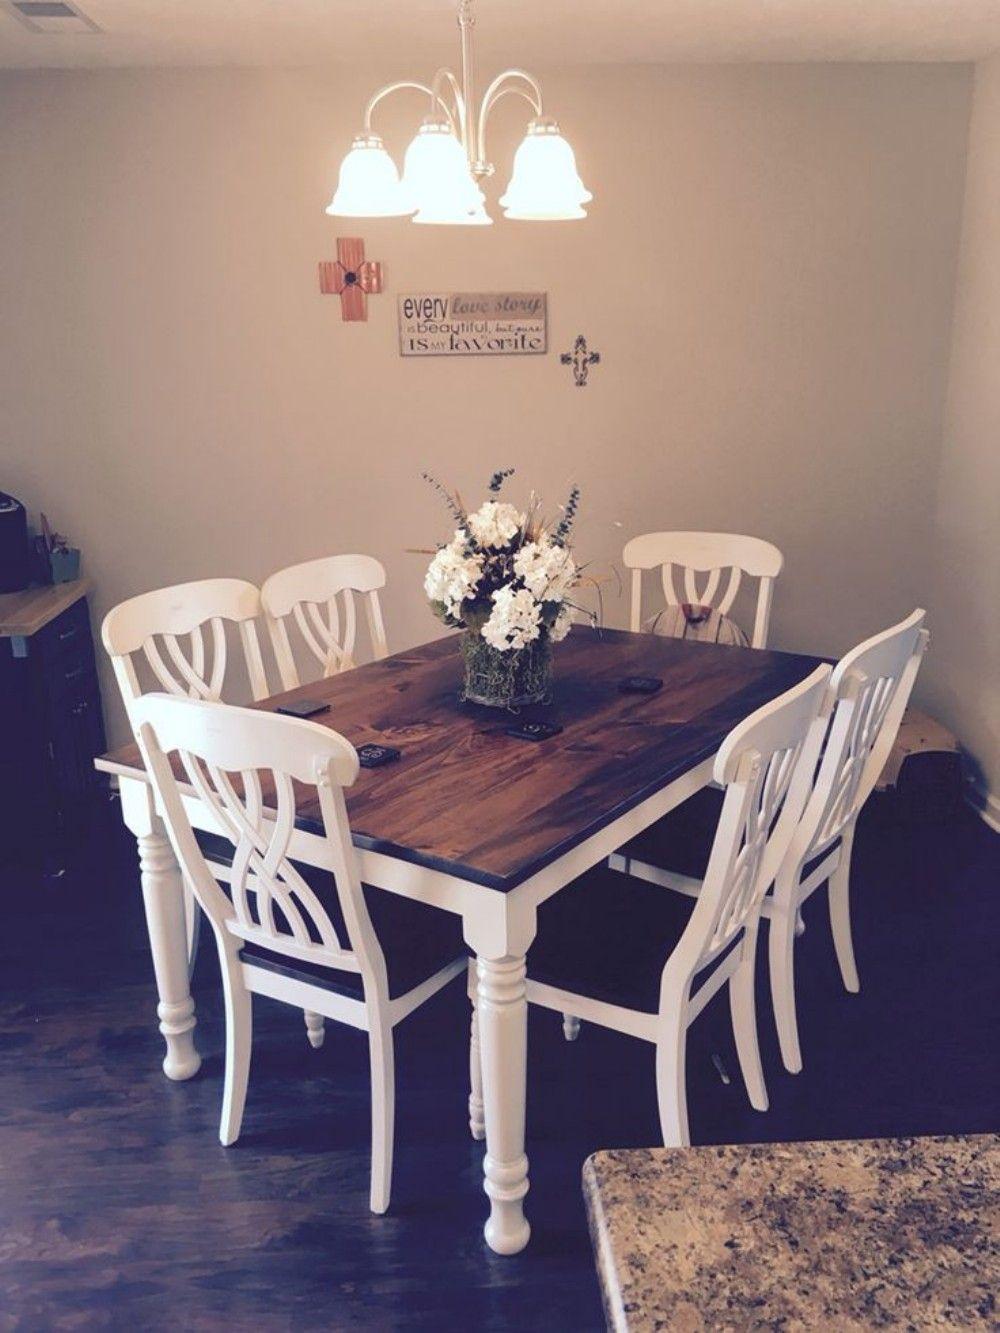 Cool 30 Ingenious Farmhouse Table Dining Room Https://homedecort.com/2017